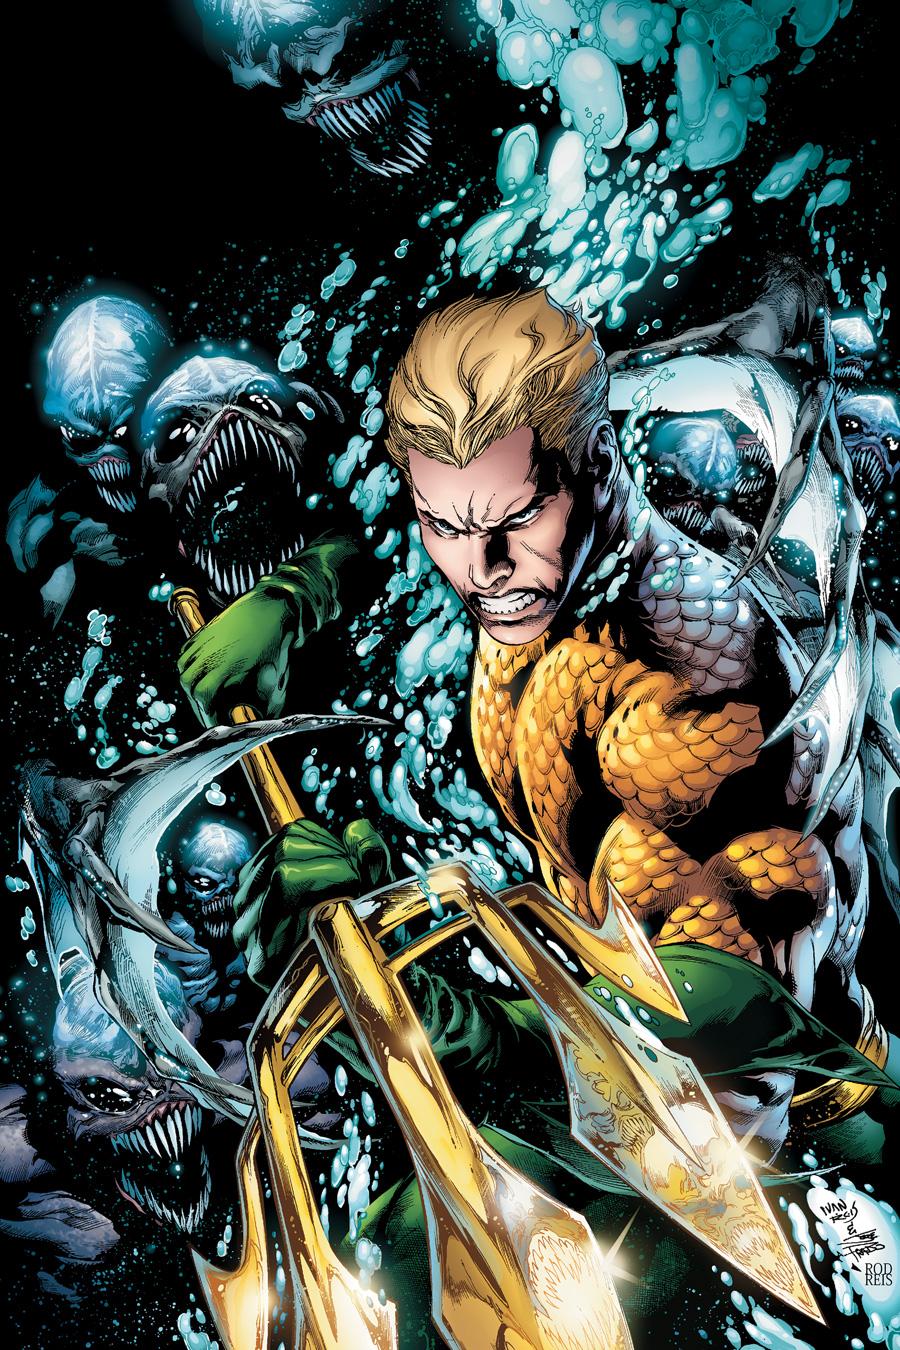 http://vignette4.wikia.nocookie.net/marvel_dc/images/5/51/Aquaman_0024.jpg/revision/latest?cb=20130516170558